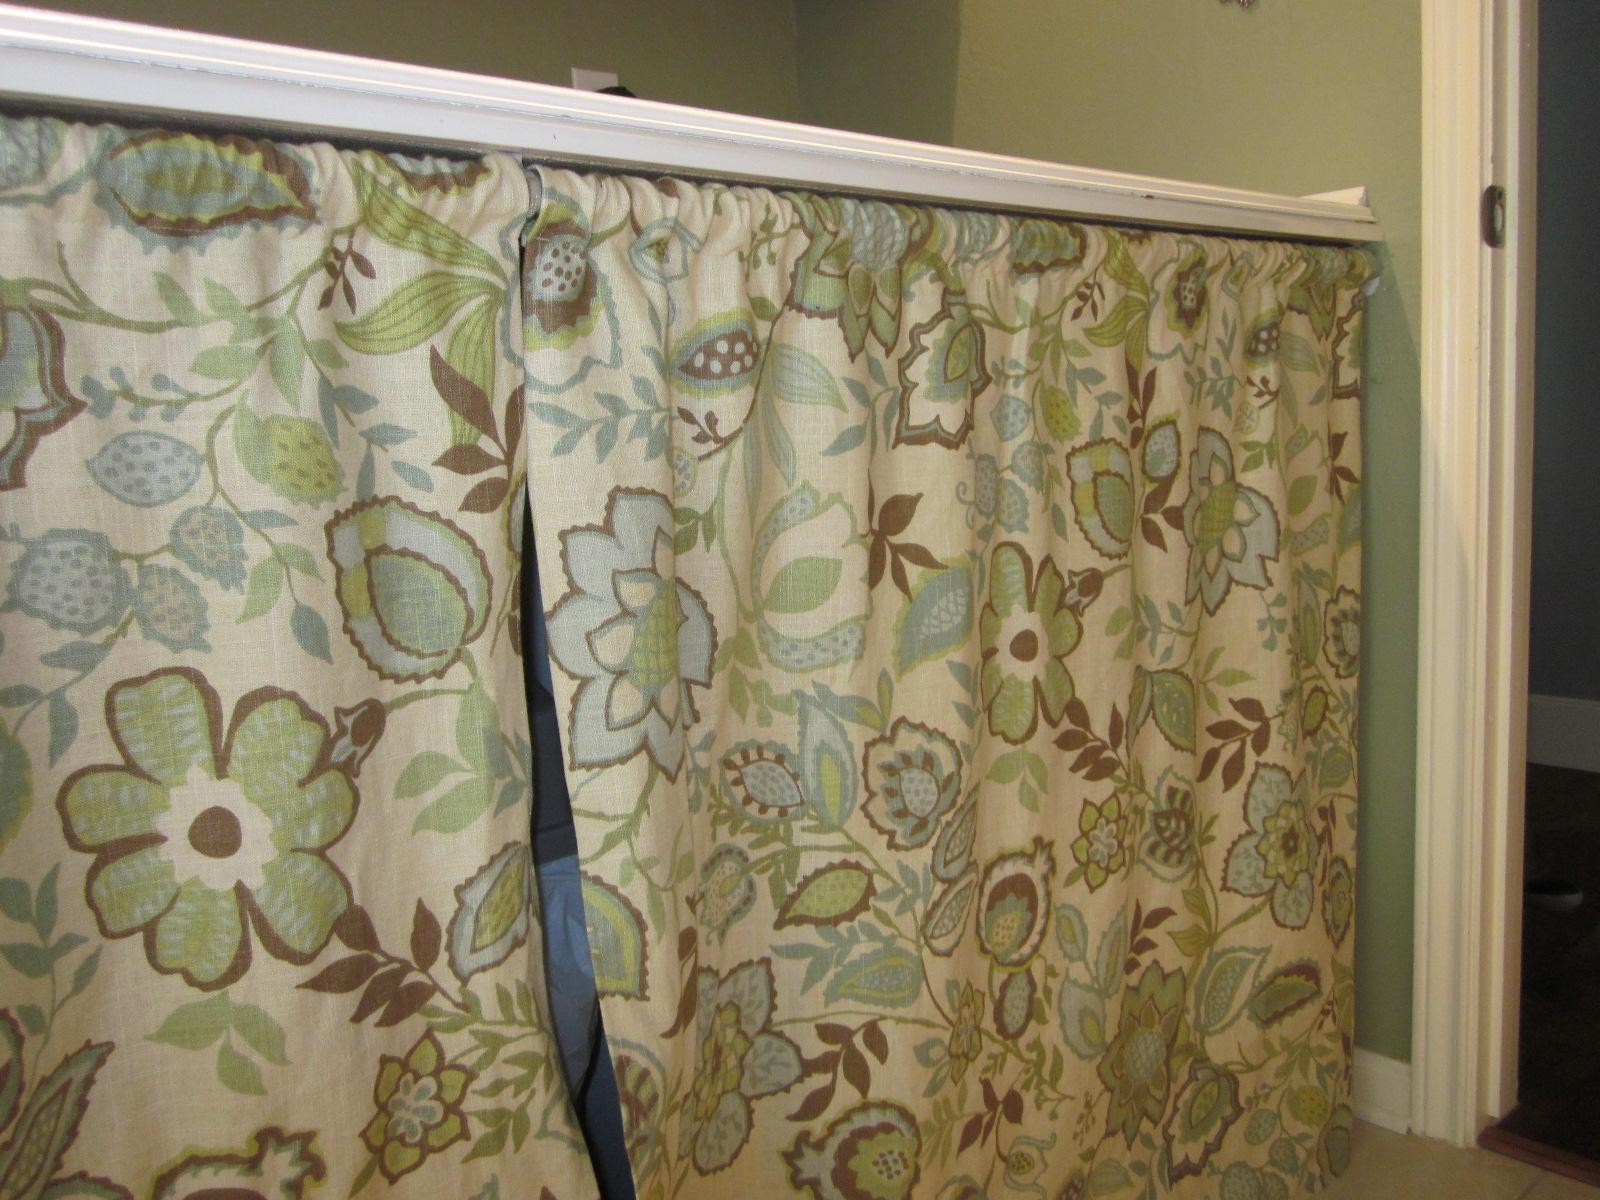 Laundry room curtains - Laundry Room Curtains